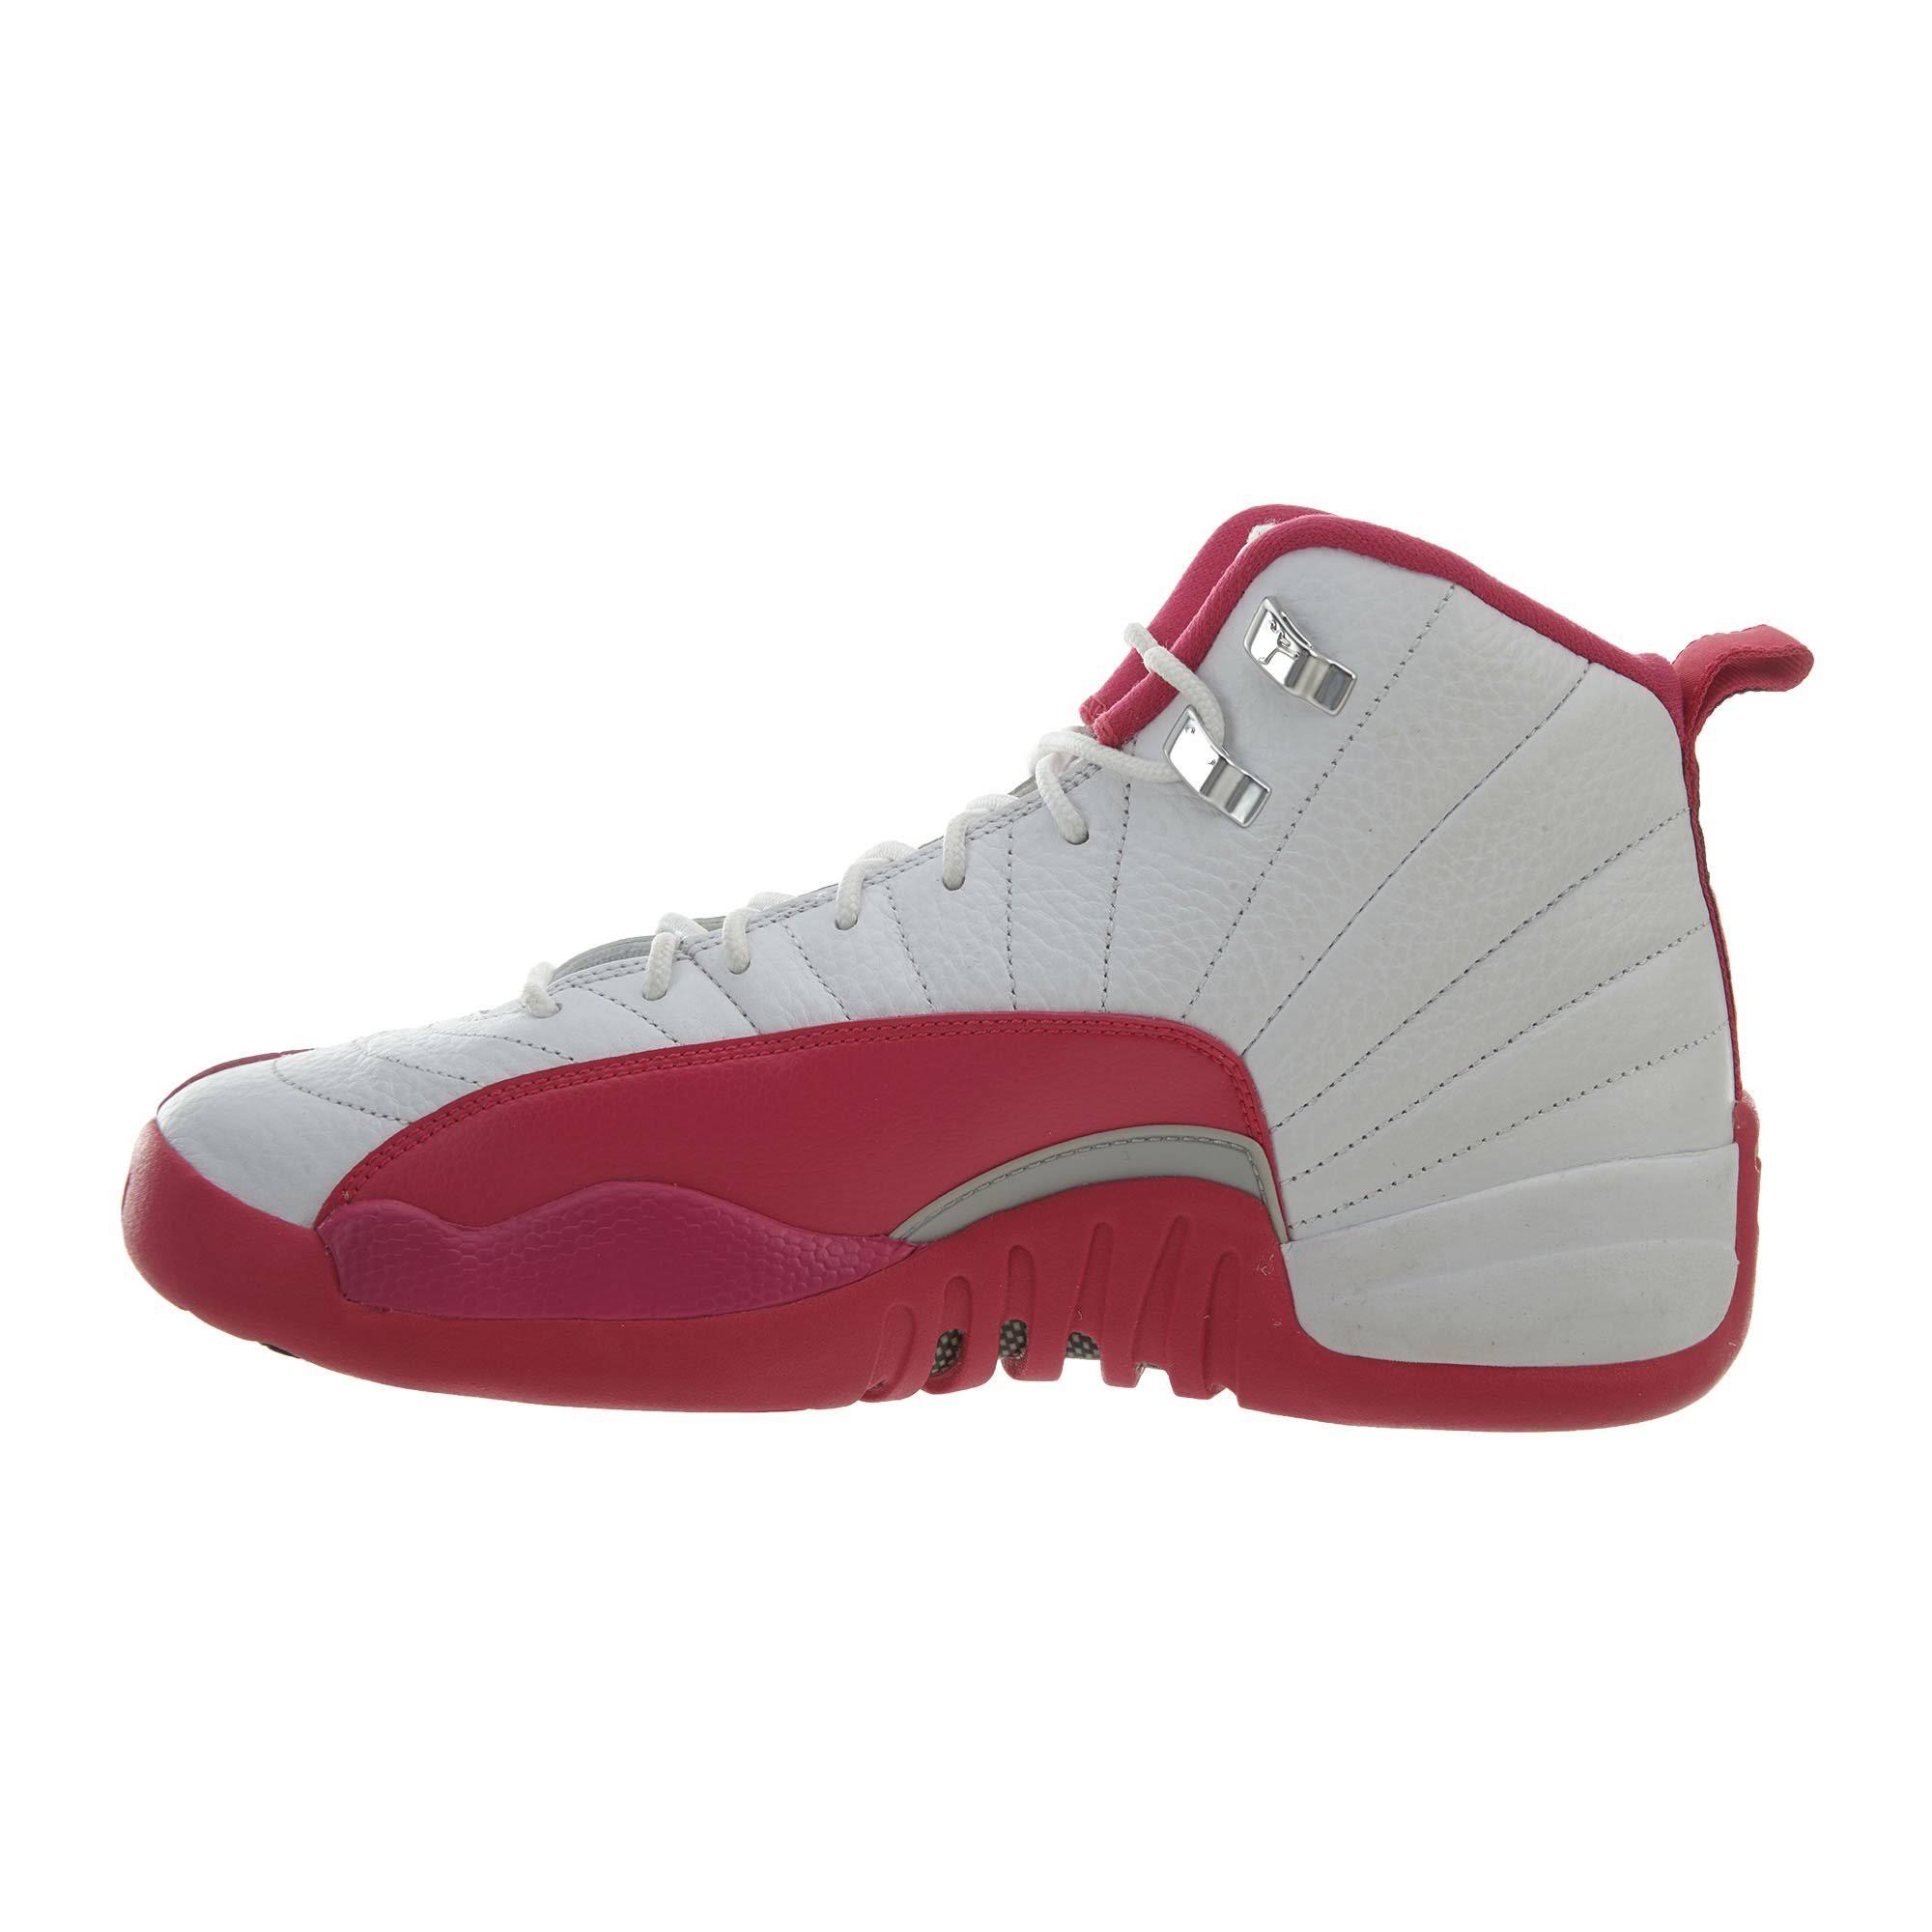 Jordan Retro Gg 109 Valentinstag Air 12 510815 4wqwT